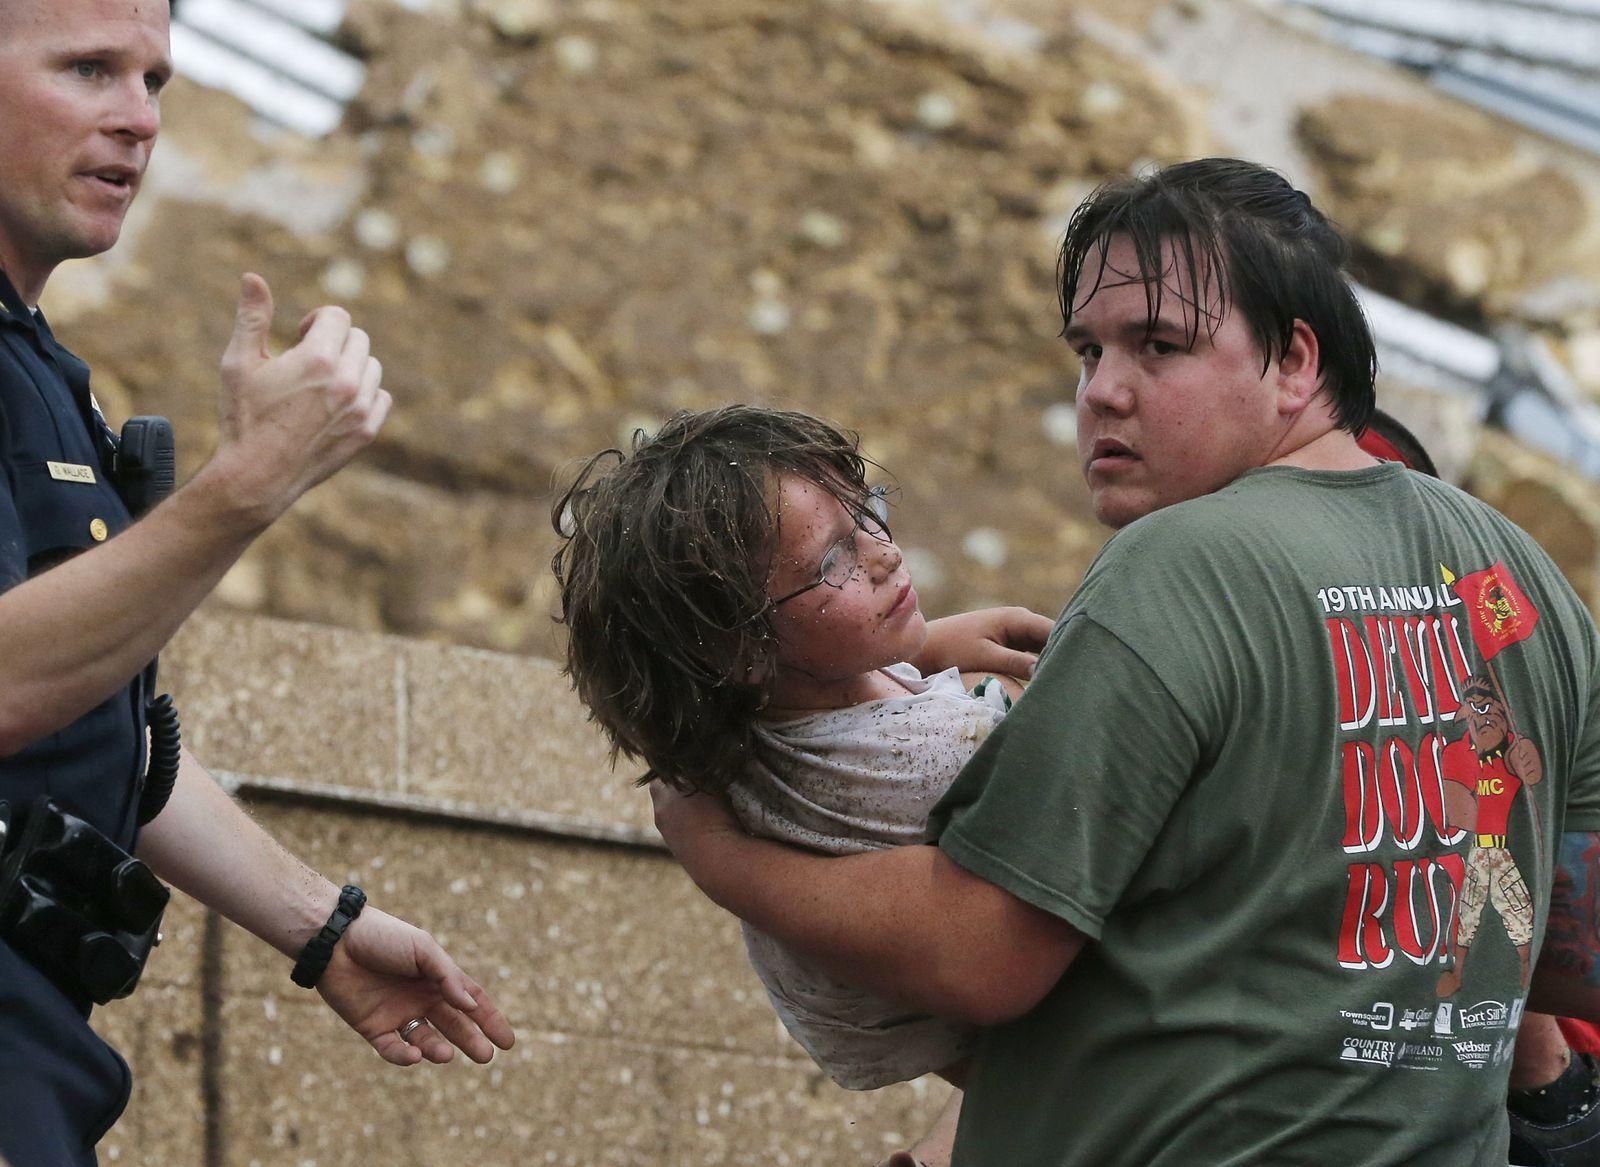 Etats-Unis: tornade meurtrière dans l'Oklahoma